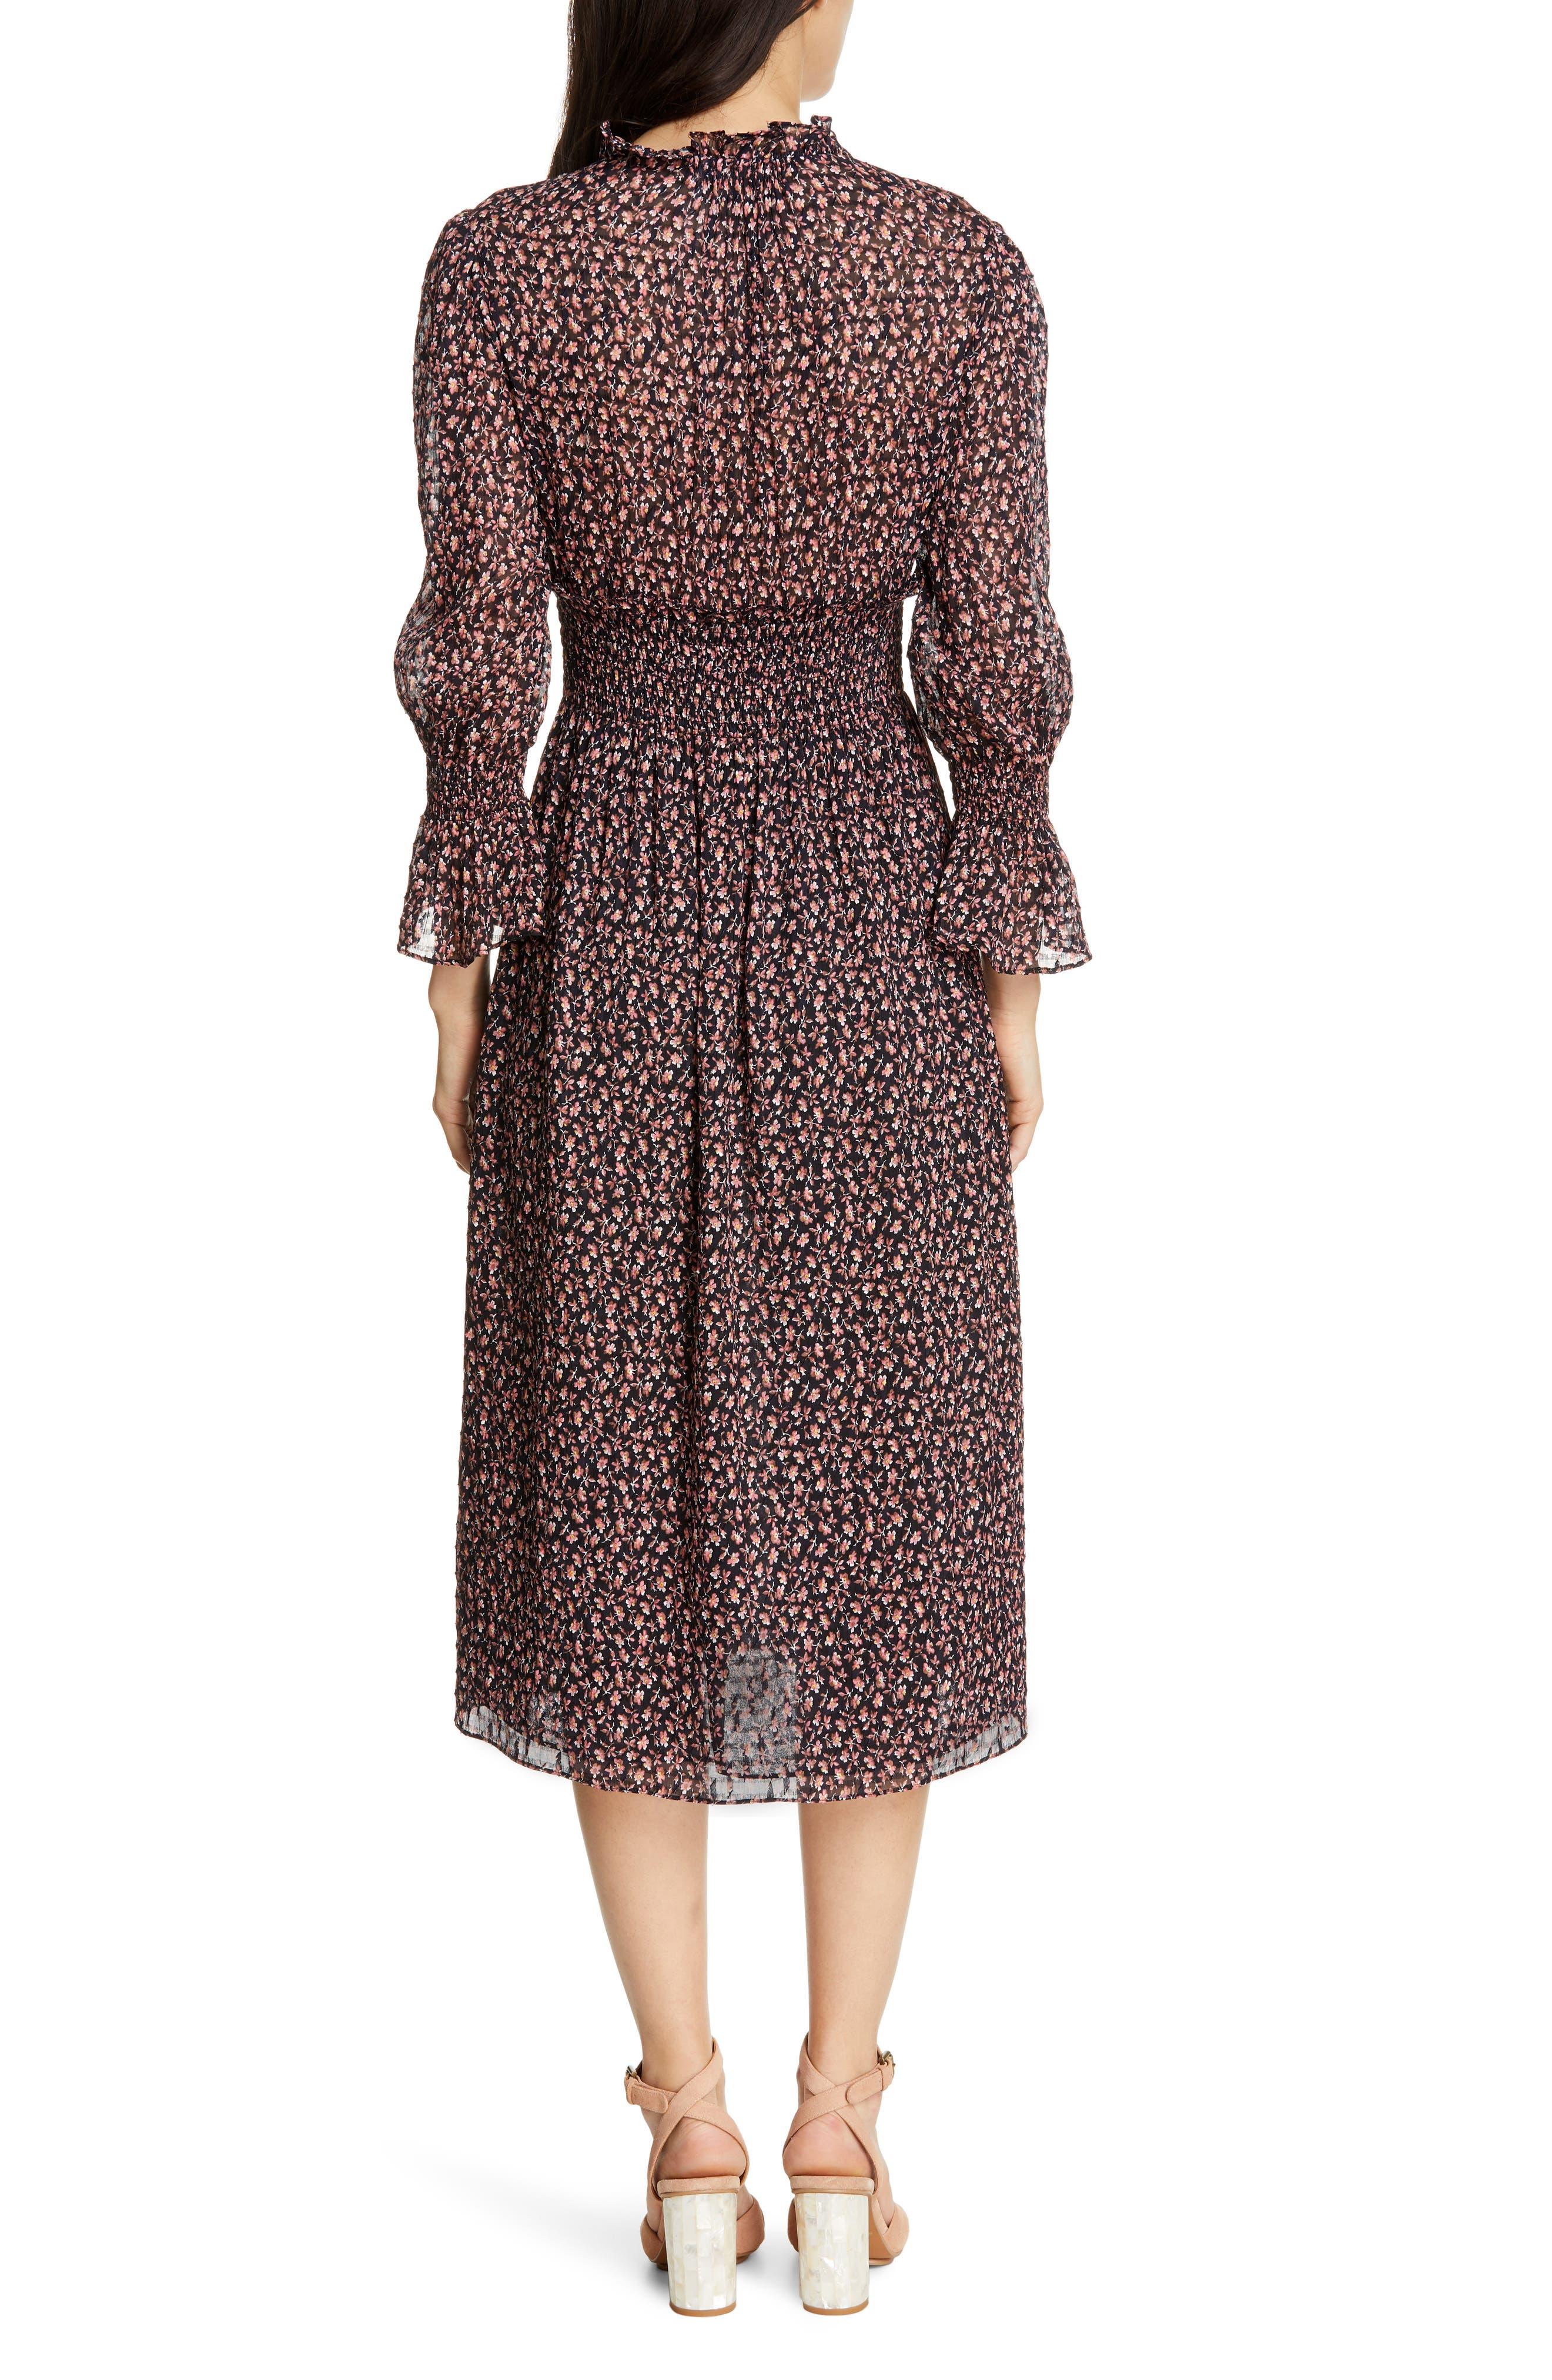 REBECCA TAYLOR, Floral Smock Detail Long Sleeve Silk & Cotton Dress, Alternate thumbnail 2, color, NAVY COMBO